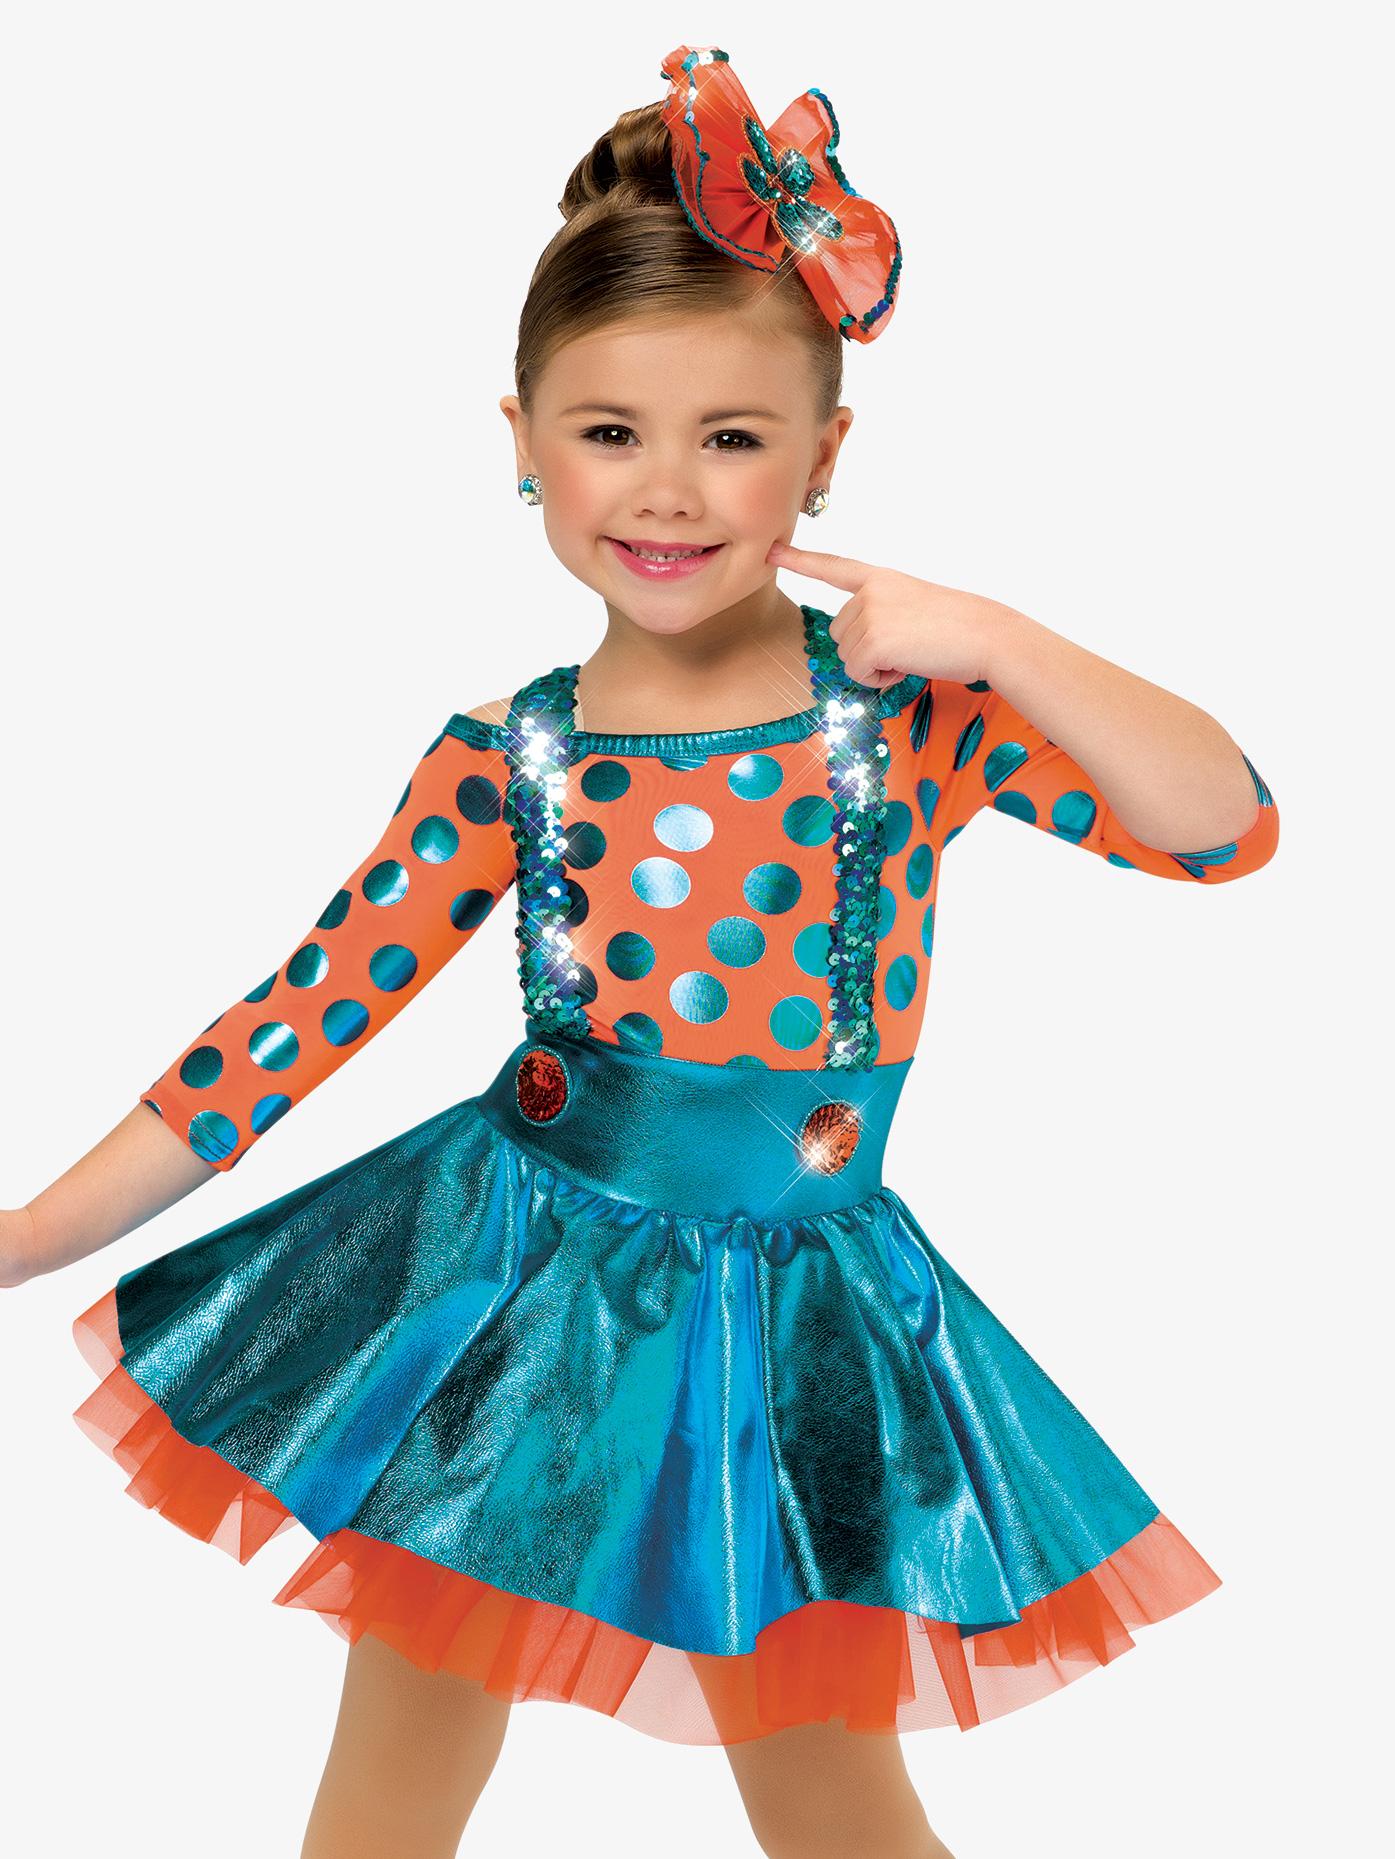 Birthday Surprise Dance Costume Polka Dot Dress Set